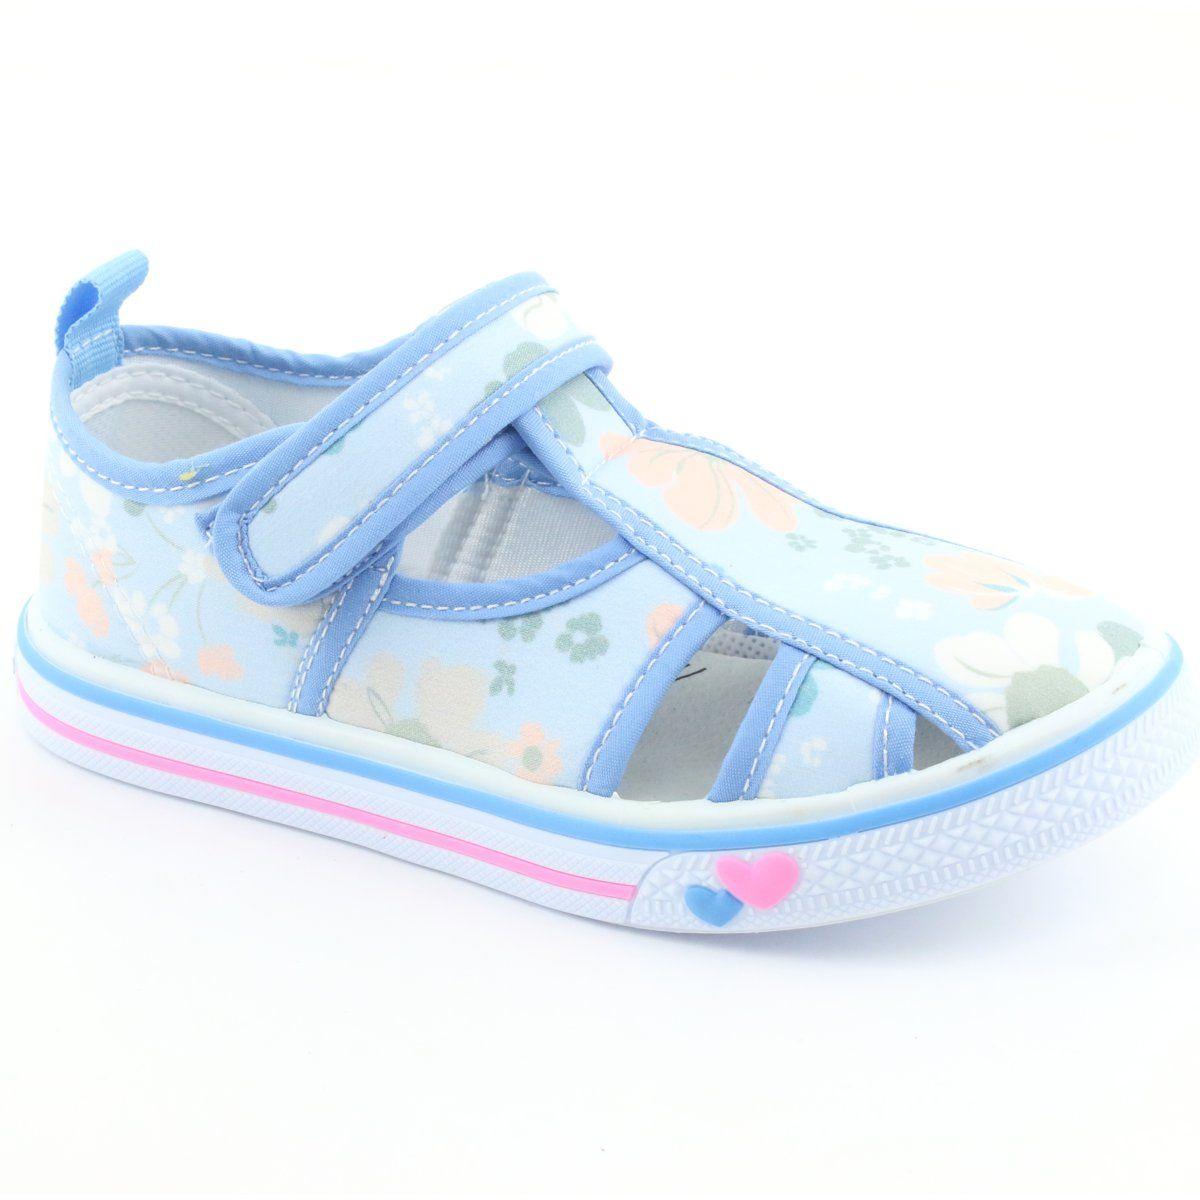 American Club Buty Dzieciece Na Rzepy Blekitne Ten 27 19 Biale Niebieskie Zielone Childrens Shoes Childrens Slippers Kid Shoes